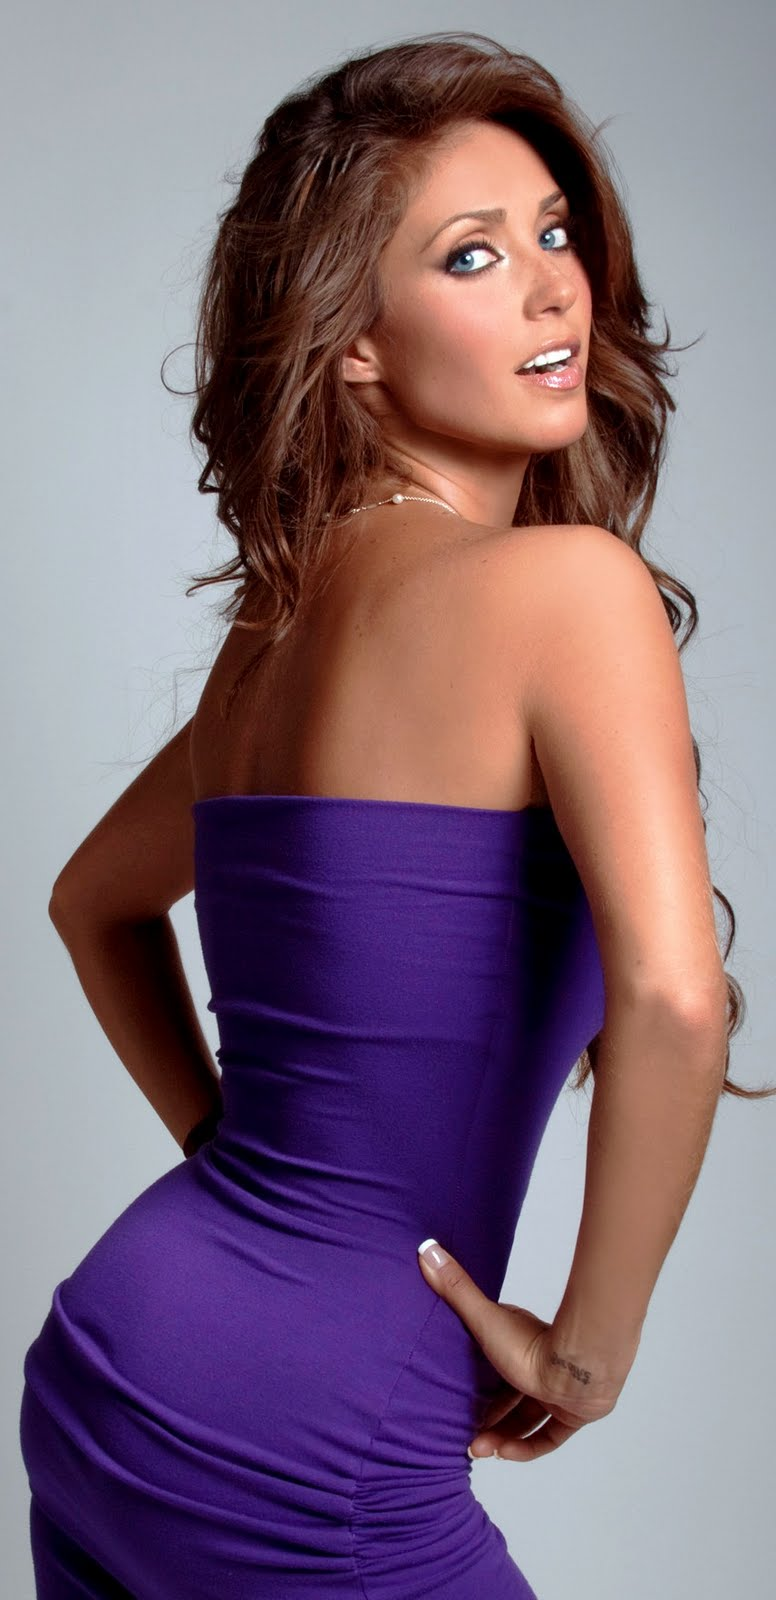 Allison Lozz Desnuda famosas-mexicanas-sin-ropa.html in kubadaky.github